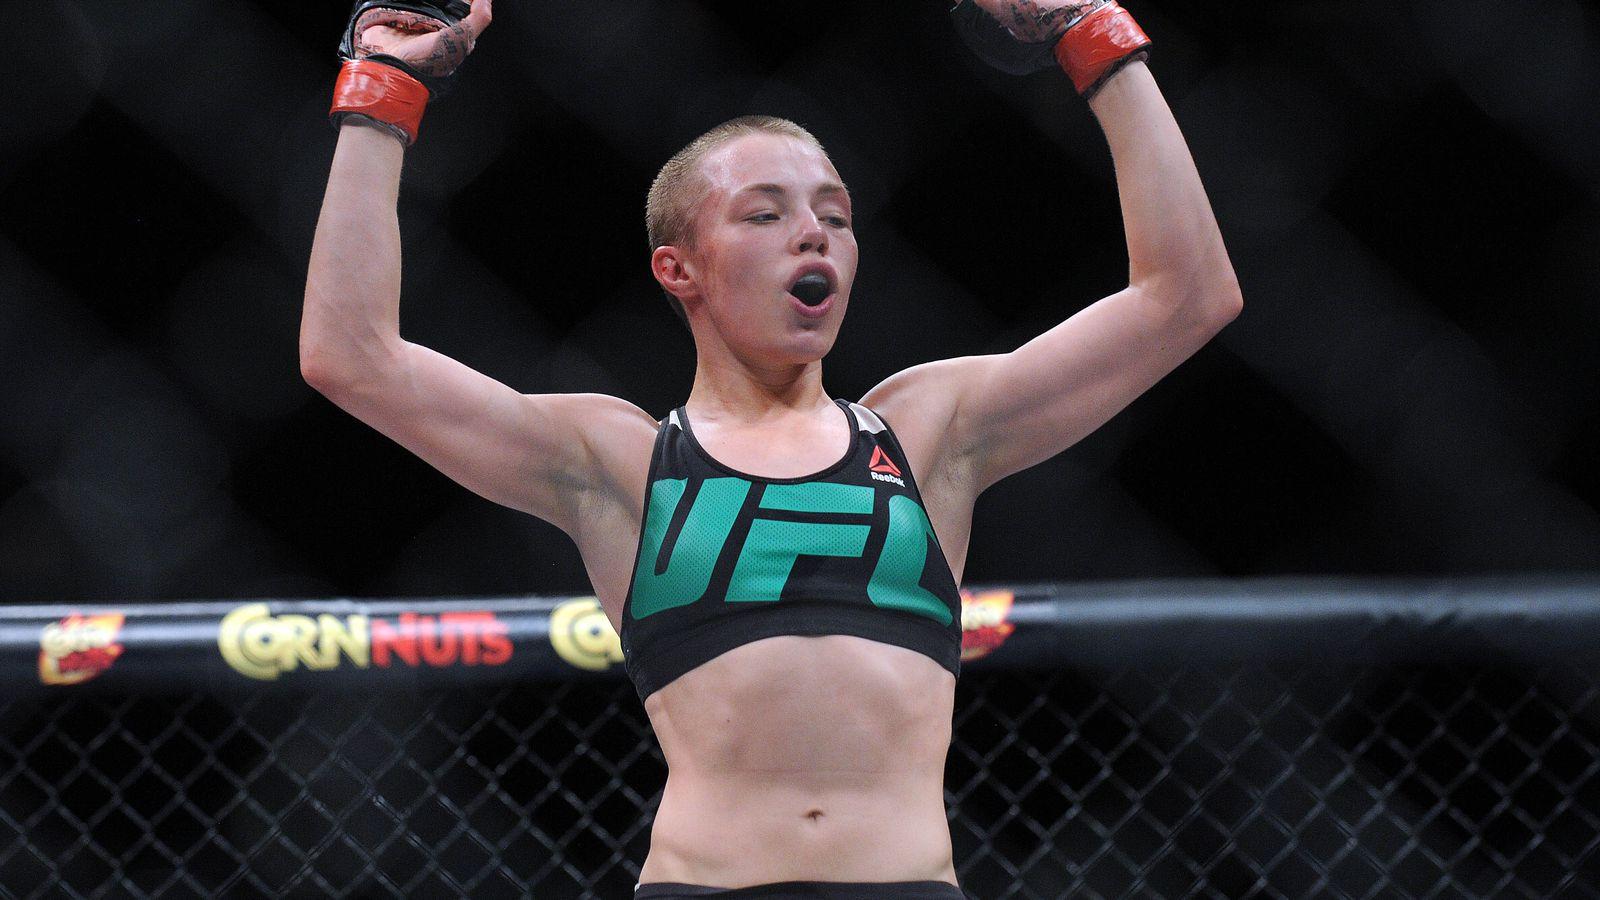 Rose Namajunas vs. Karolina Kowalkiewicz added to UFC 201 - Bloody Elbow